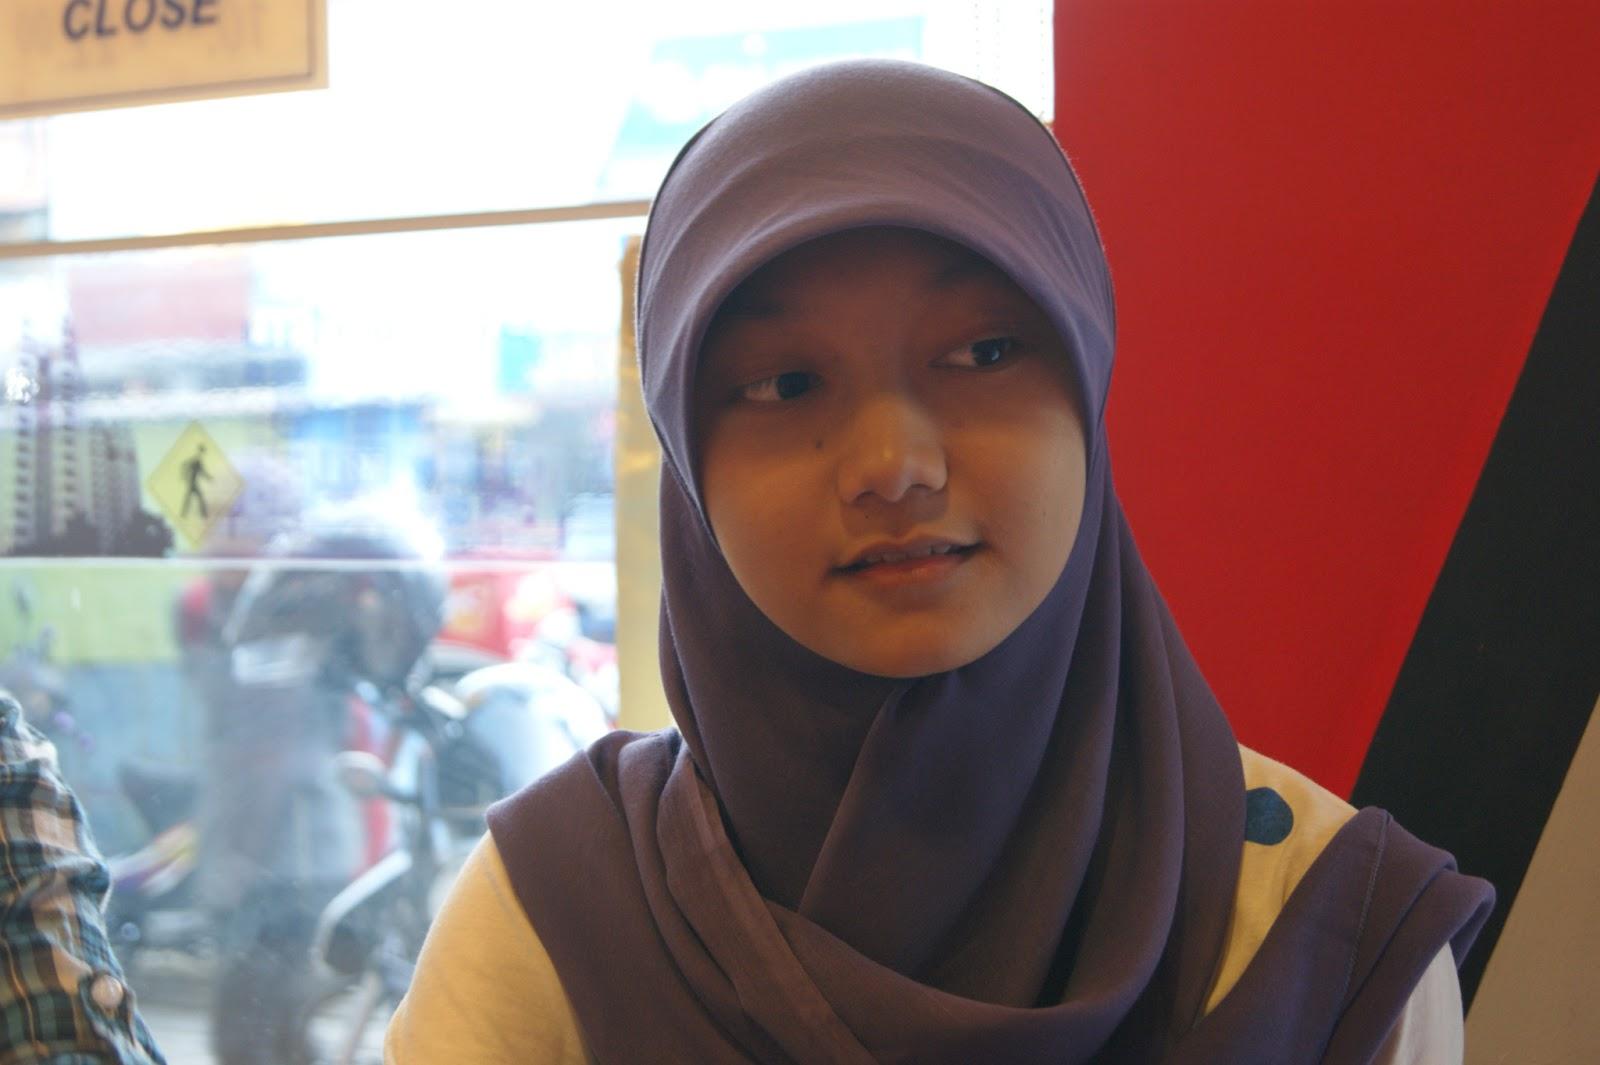 Paguneman Basa Sunda Garnawis Sunda Buncirblogspot Kumpulan Naskah Drama Persahabatan 8 Orang Bahasa Inggris